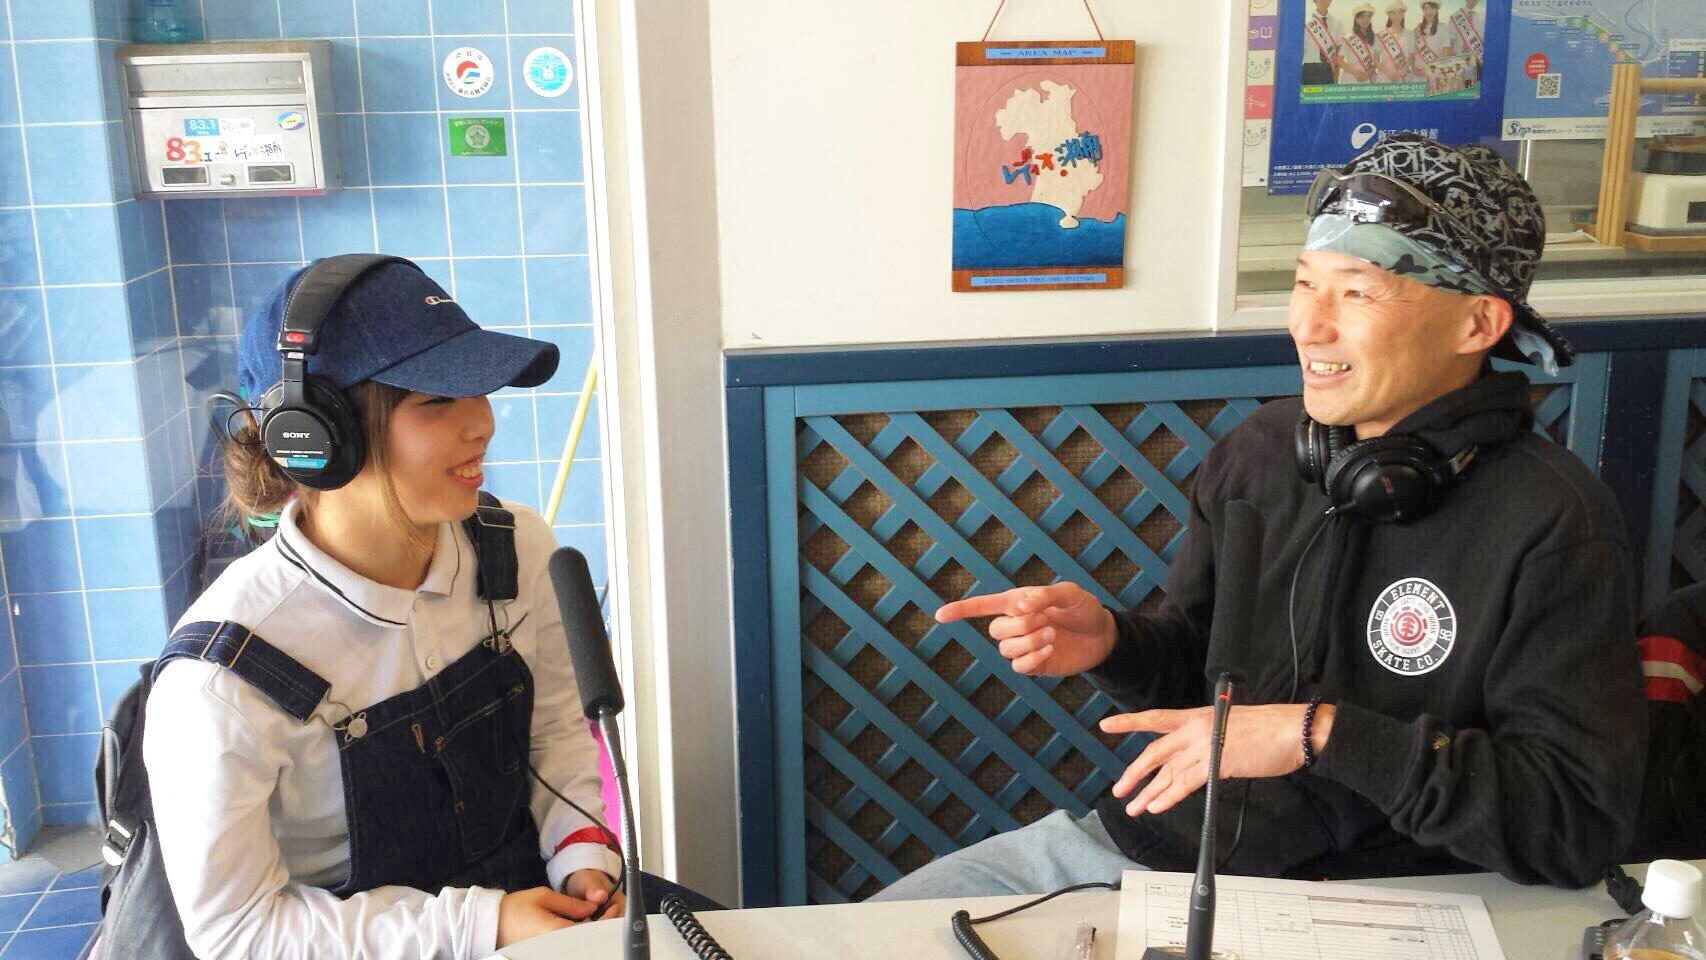 ICHI(Calvo道場)&MYW(Kanamyw)ラジオ番組でスペシャル対談